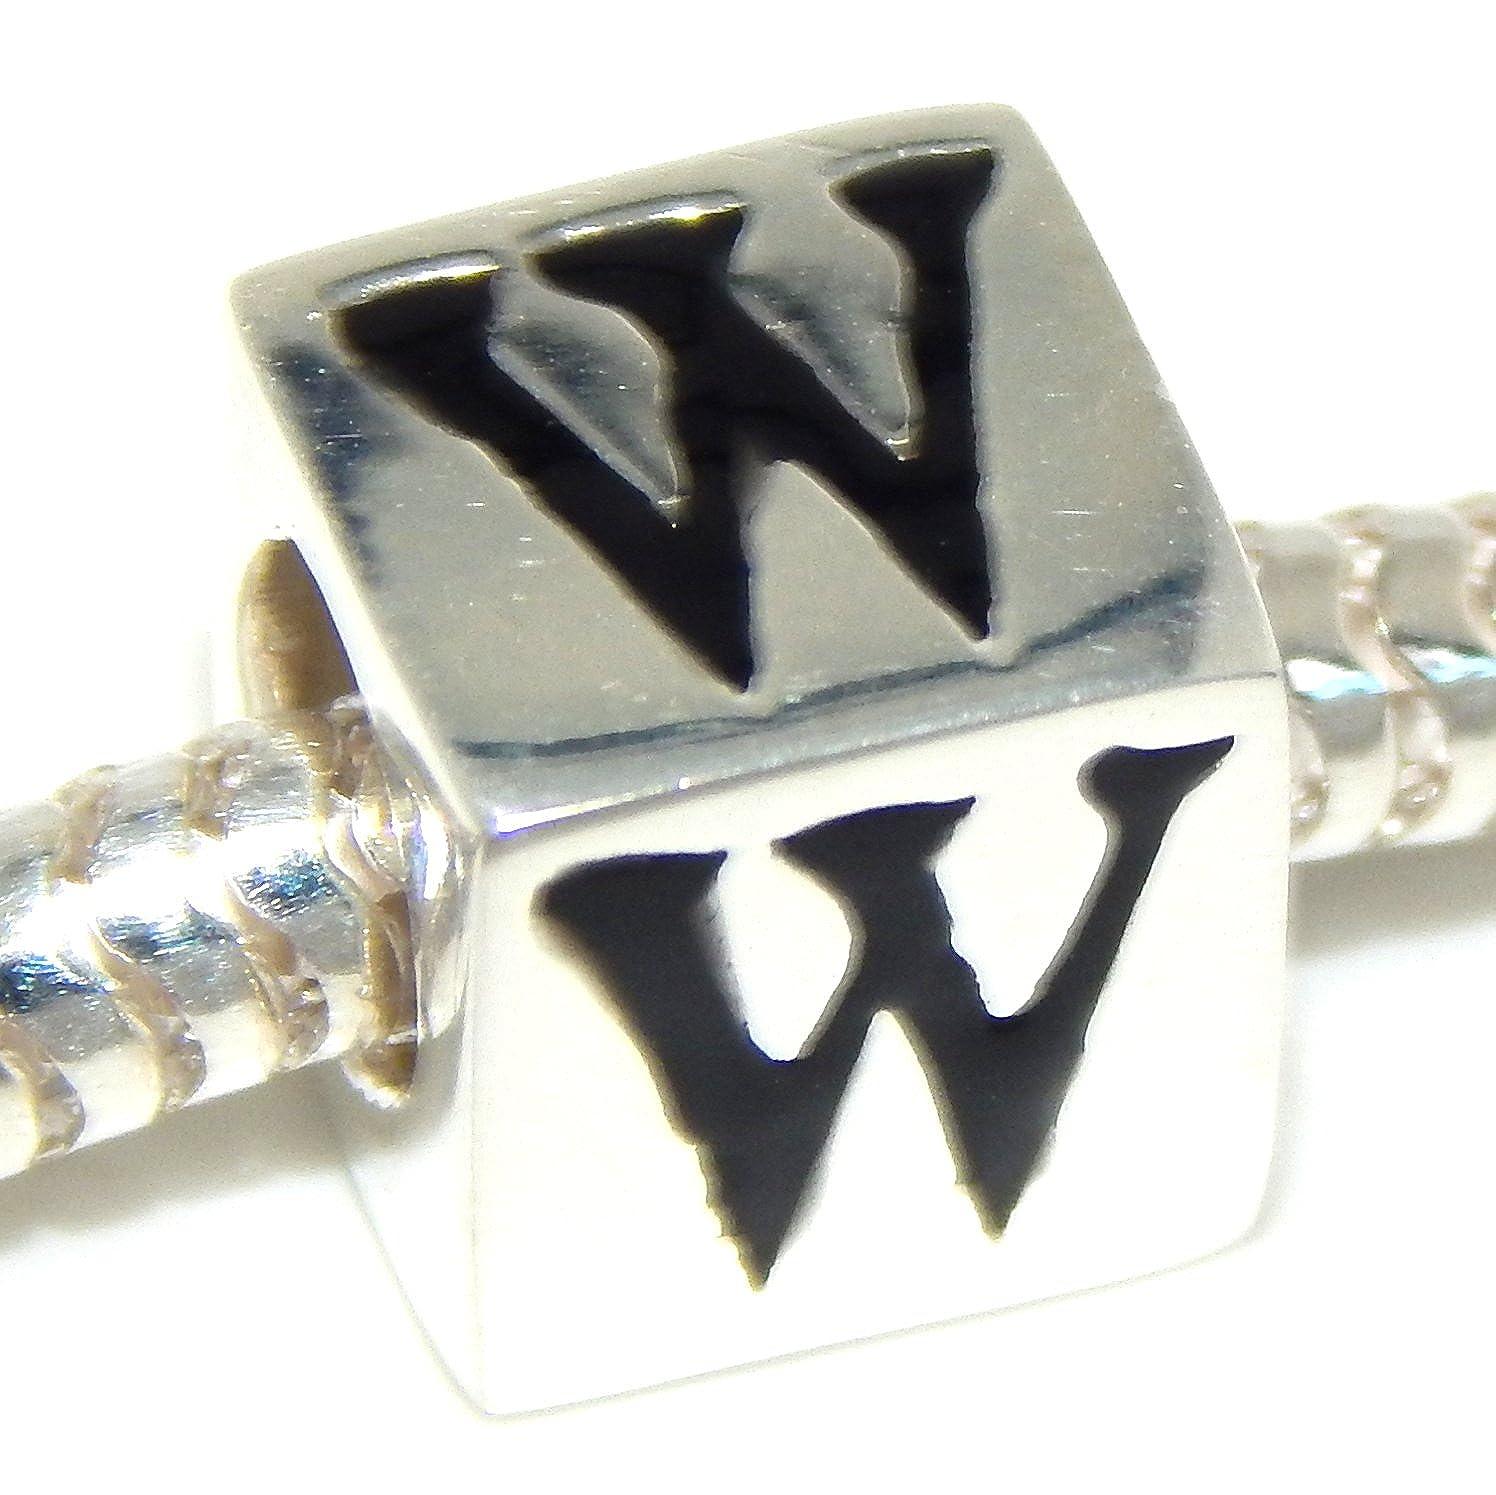 ICYROSE Solid 925 Sterling Silver Block Letter Charm Bead for European Snake Chain Bracelets